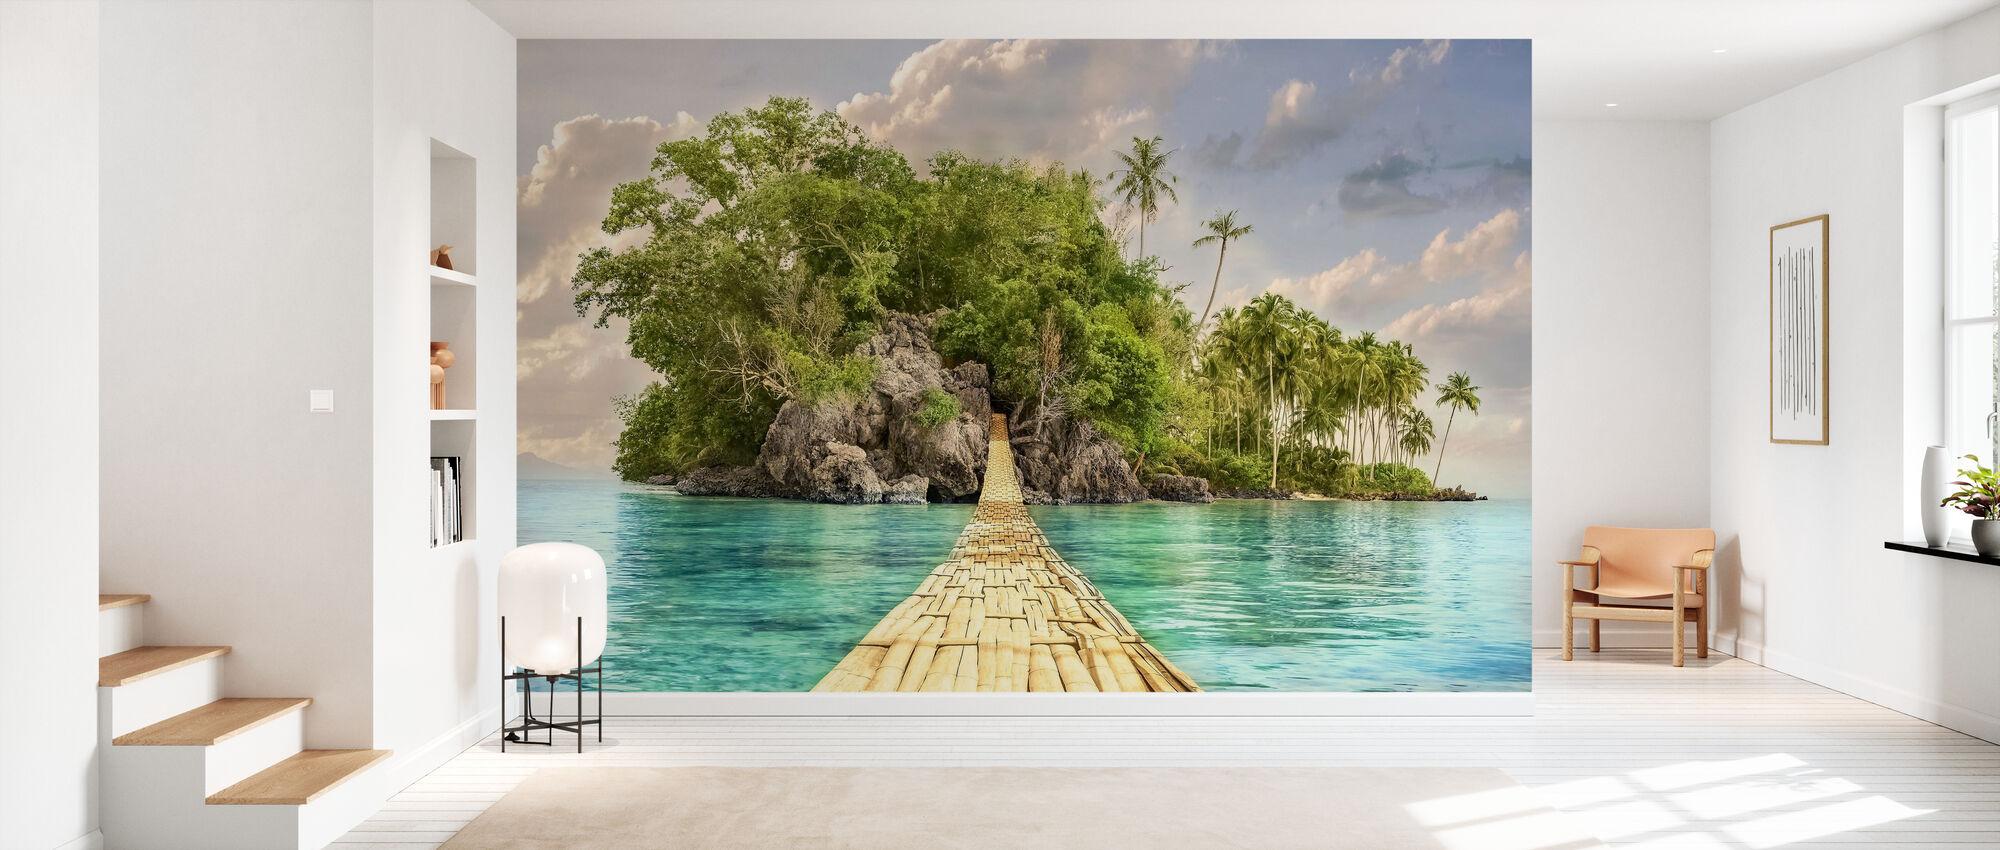 Pathway to the Island - Wallpaper - Hallway